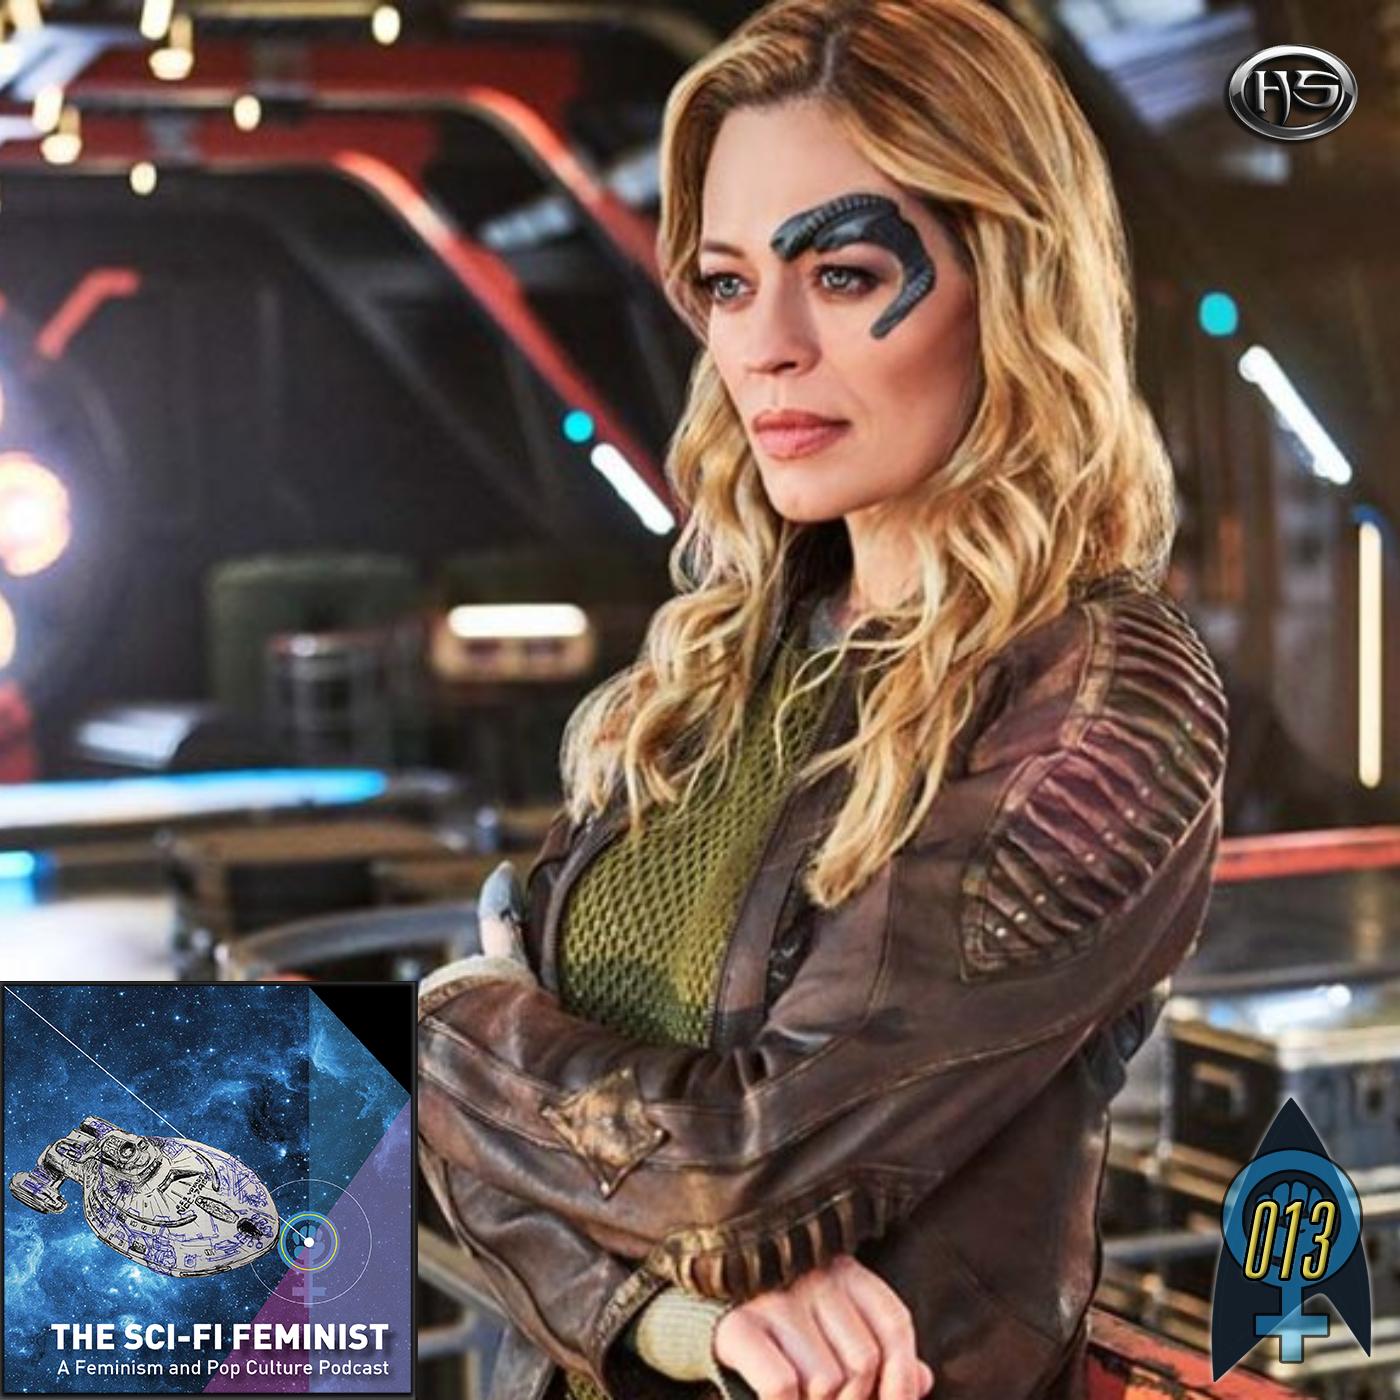 The Sci-Fi Feminist Episode 13